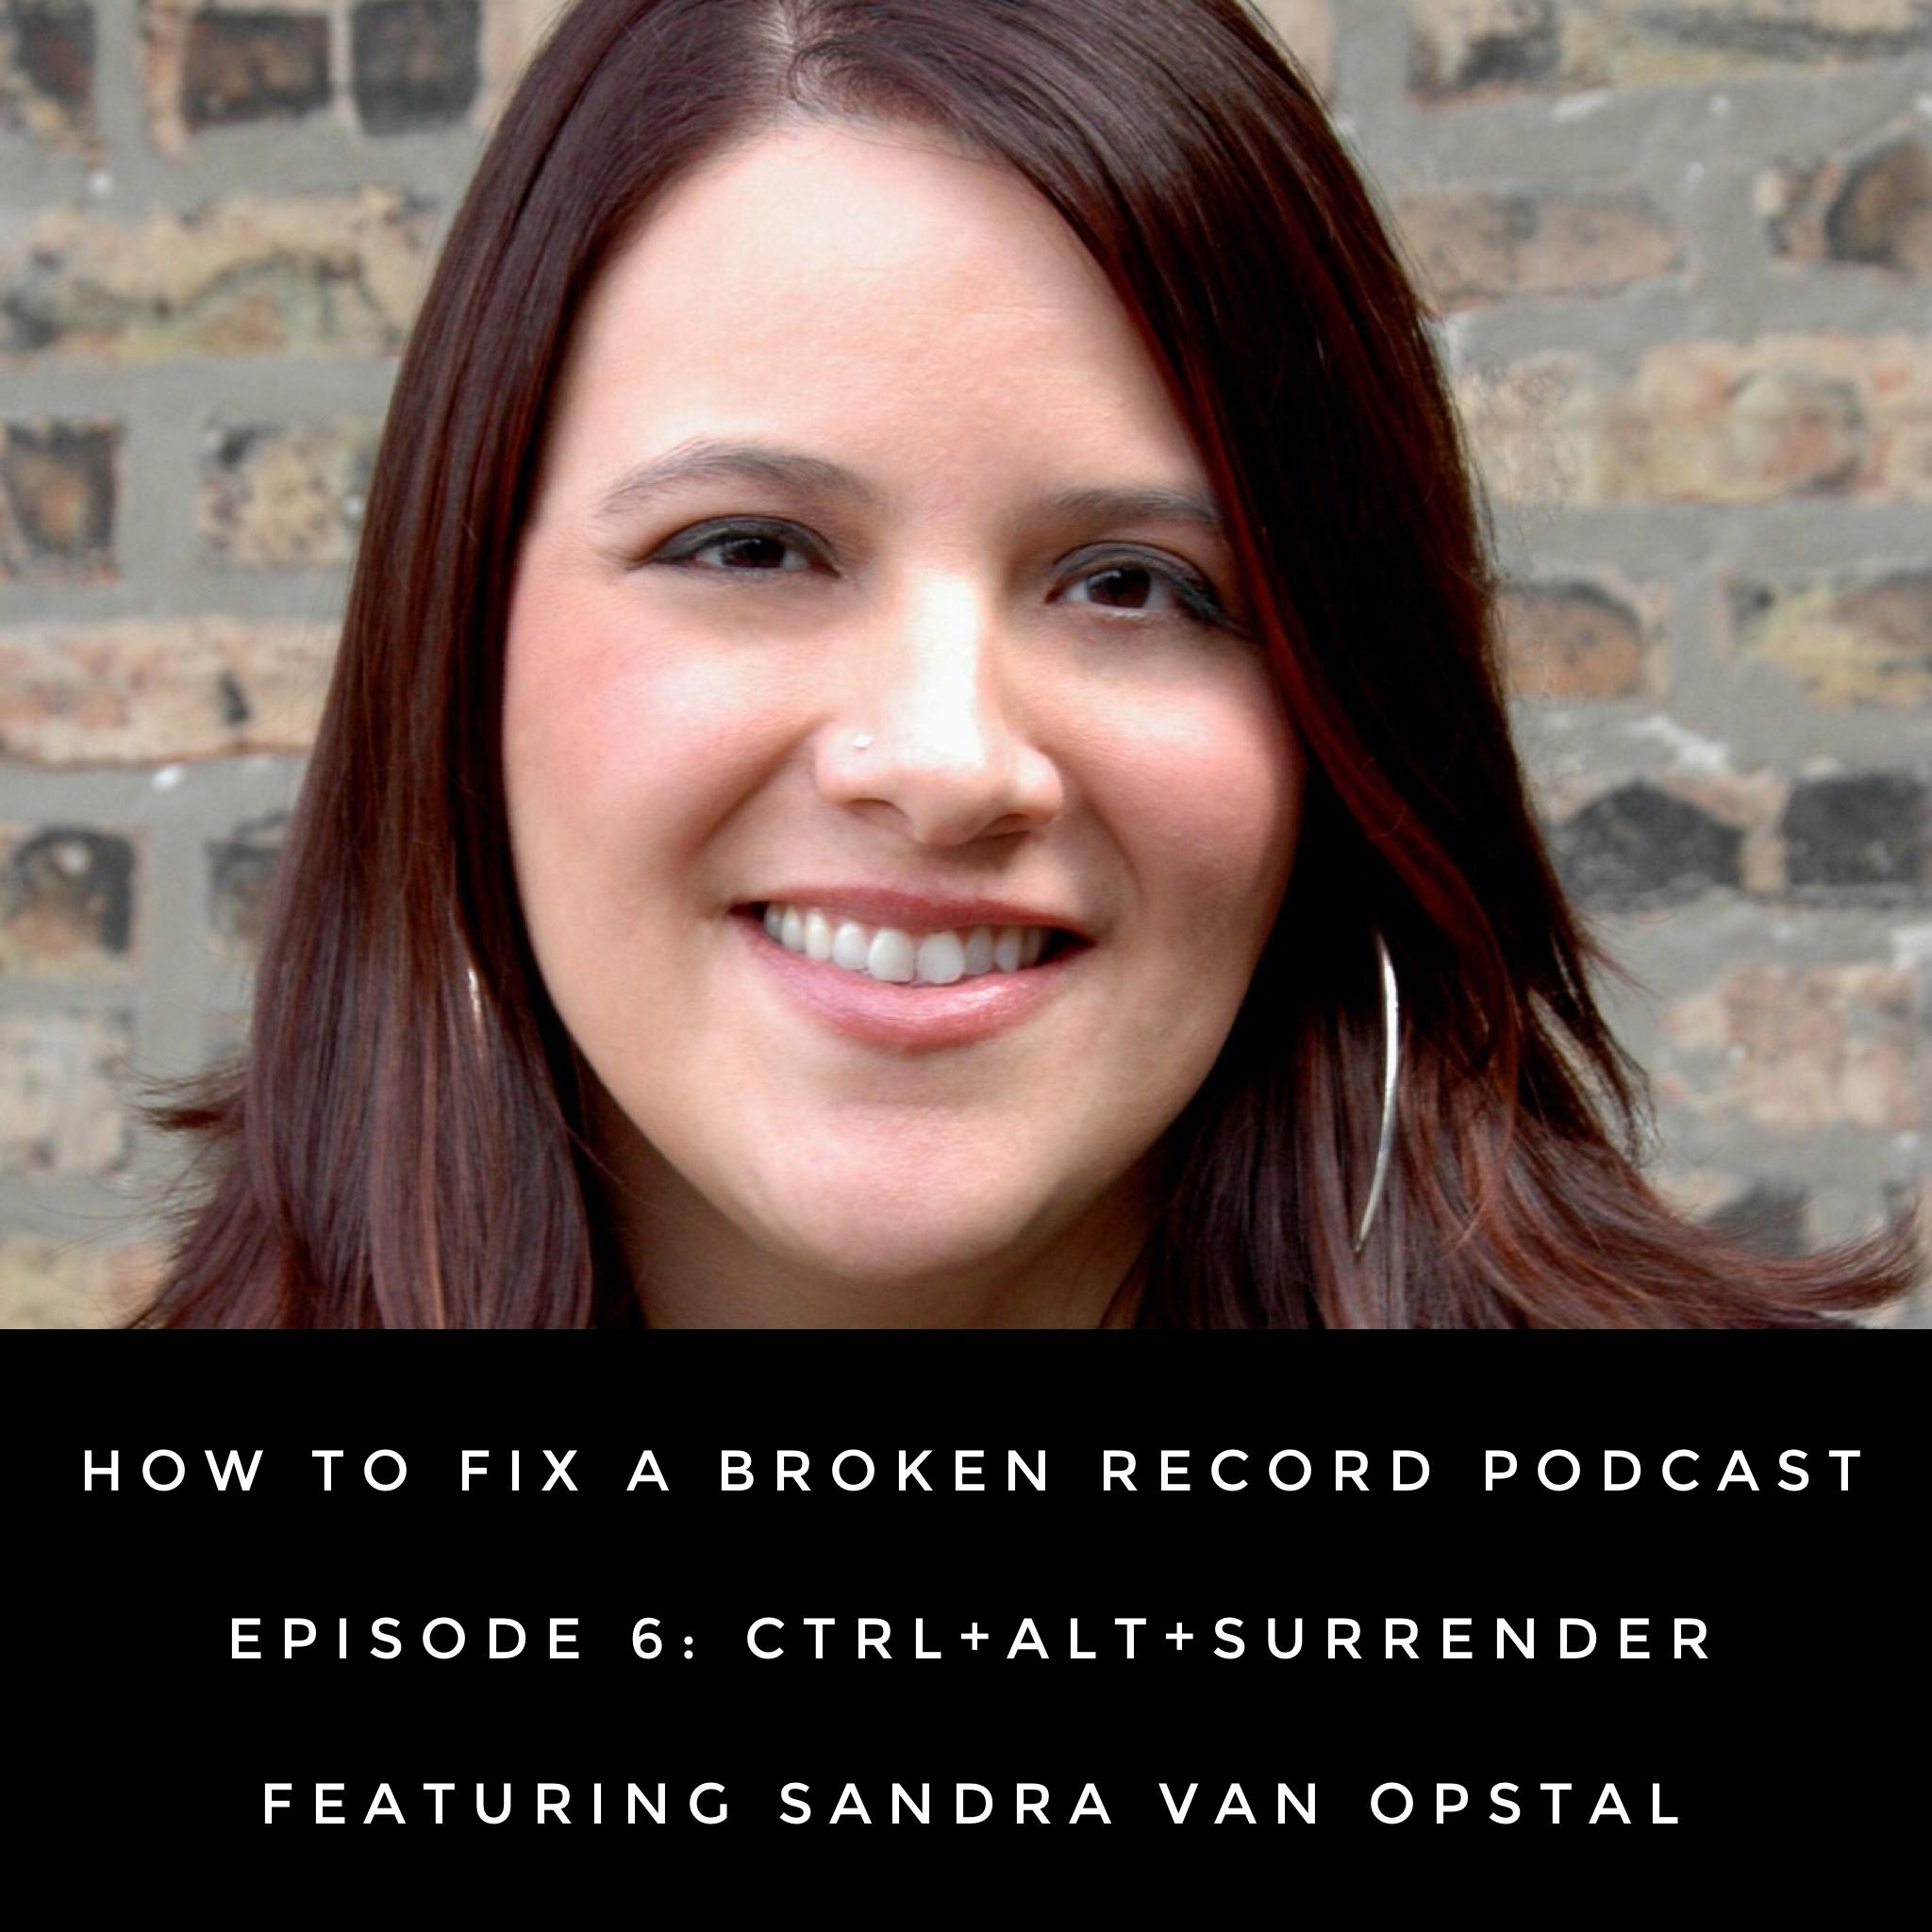 How To Fix A Broken Record Podcast Episode 6: Ctrl+Alt+Surrender featuring Sandra Van Opstal